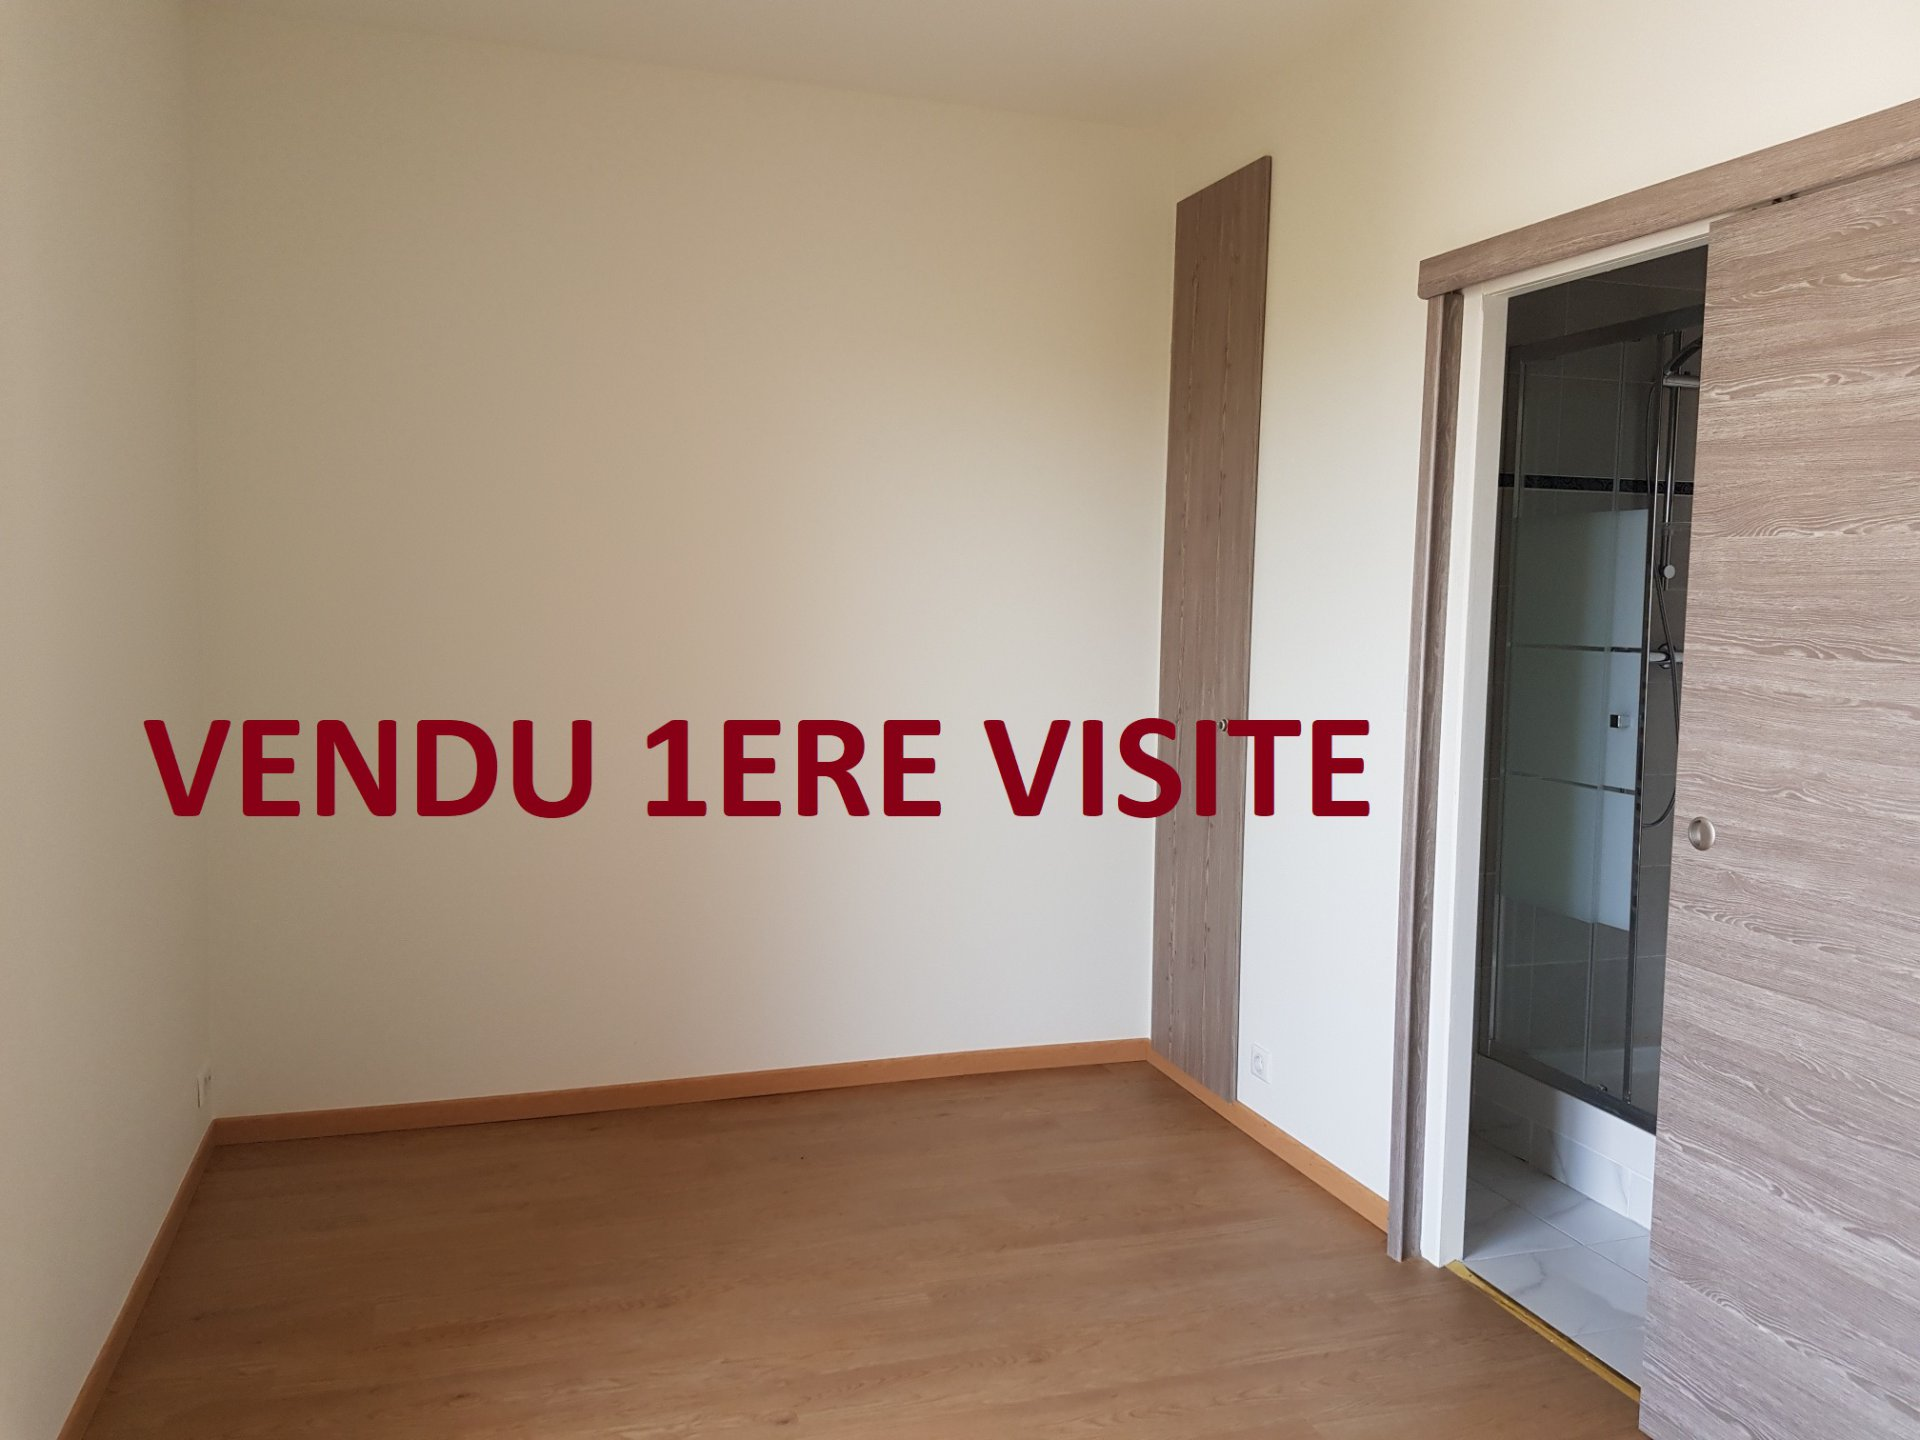 Venta Estudio - Toulouse